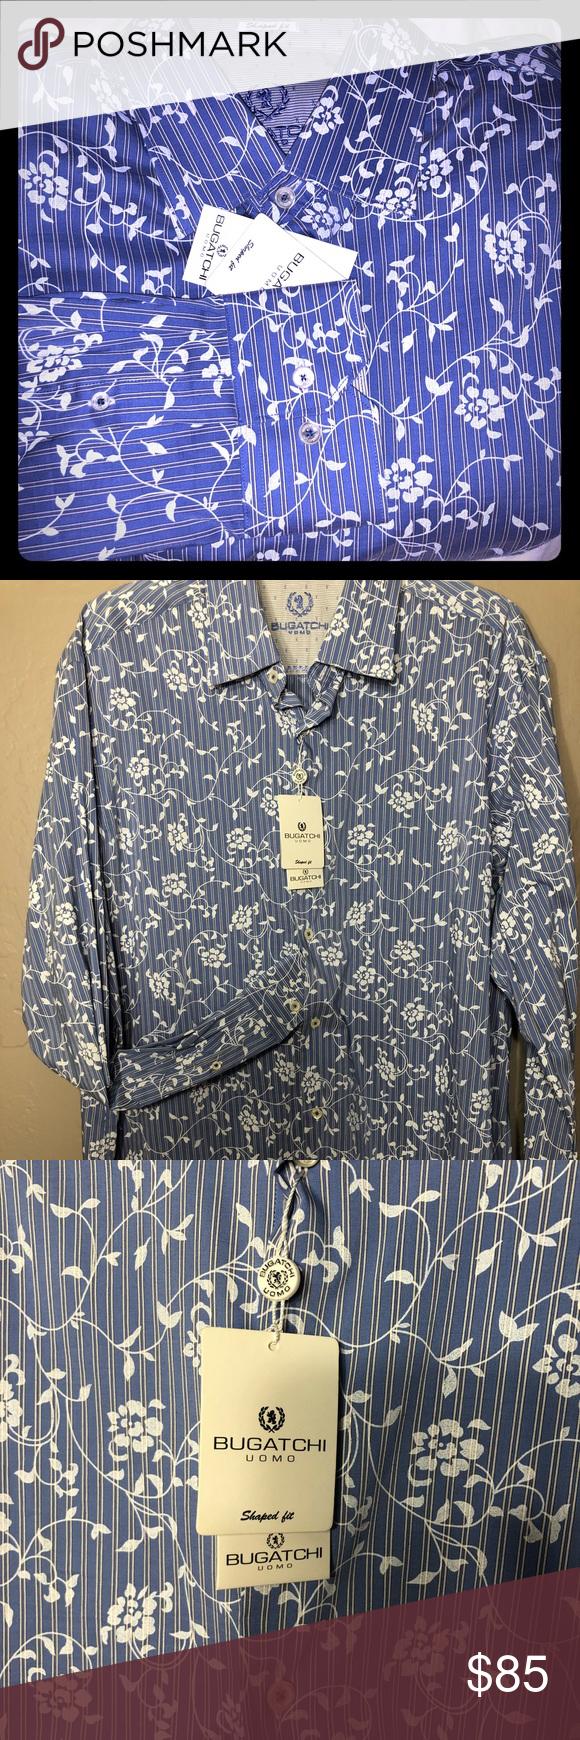 cc7b04c3 BUGATCHI MEN'S CASUAL BUTTON-FRONT SHIRT Brand new classic Blue Bugatchi  UOMO Shaped fit , Long sleeve 75% Cotton—25% polyester Size XL Bugatchi  Shirts ...